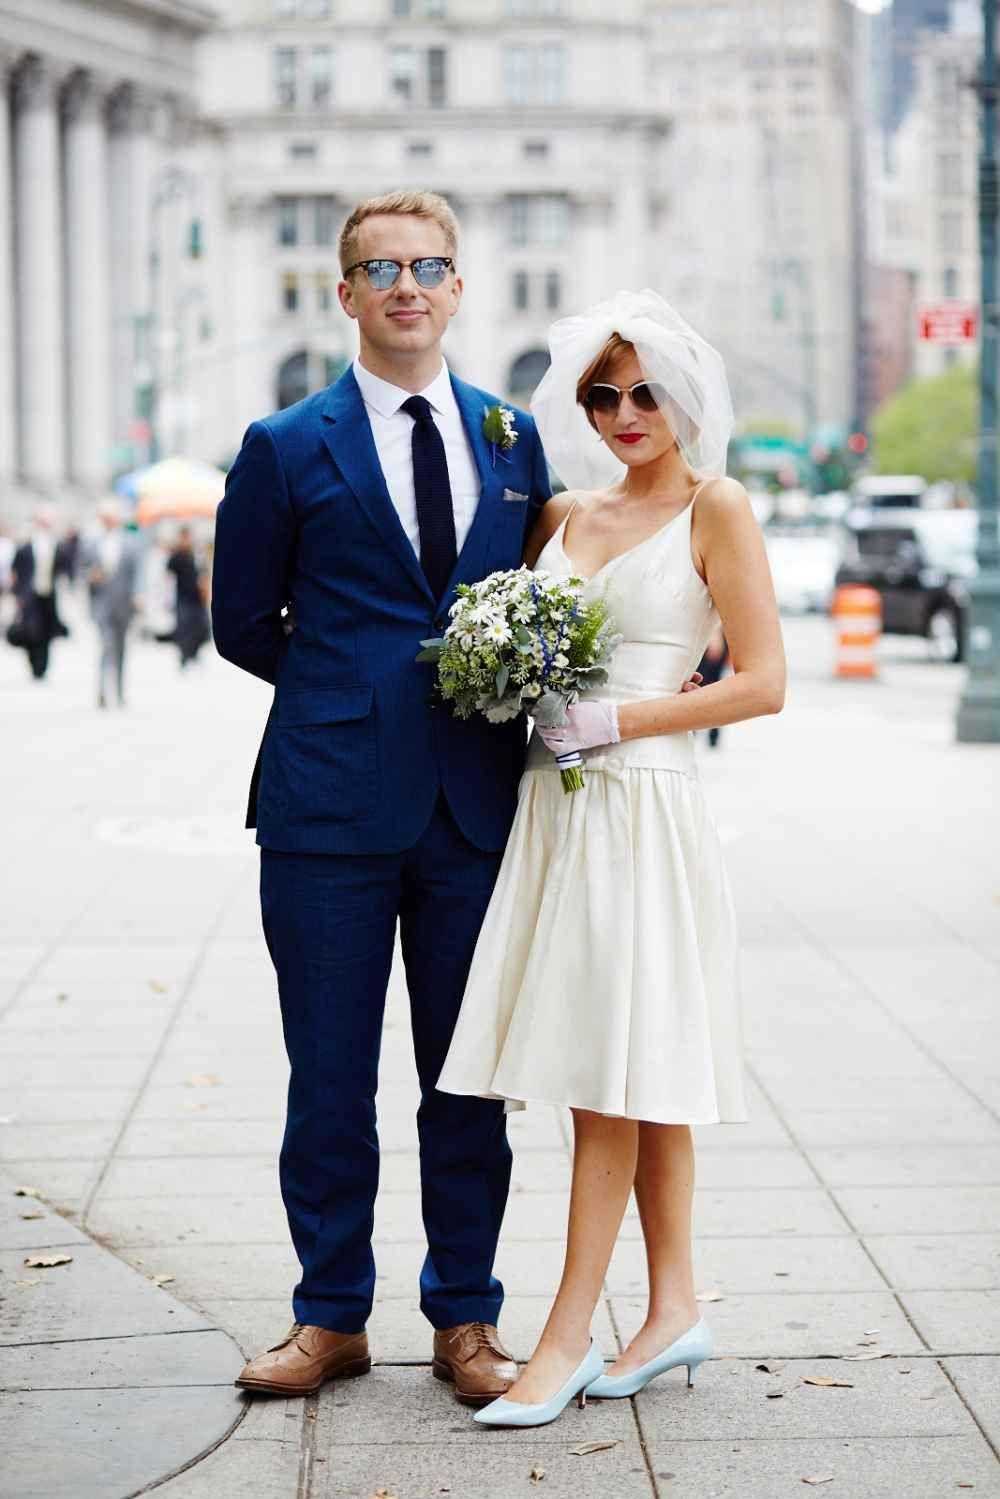 Wedding style city hall new york wedding styles weddings and wedding style city hall new york junglespirit Gallery